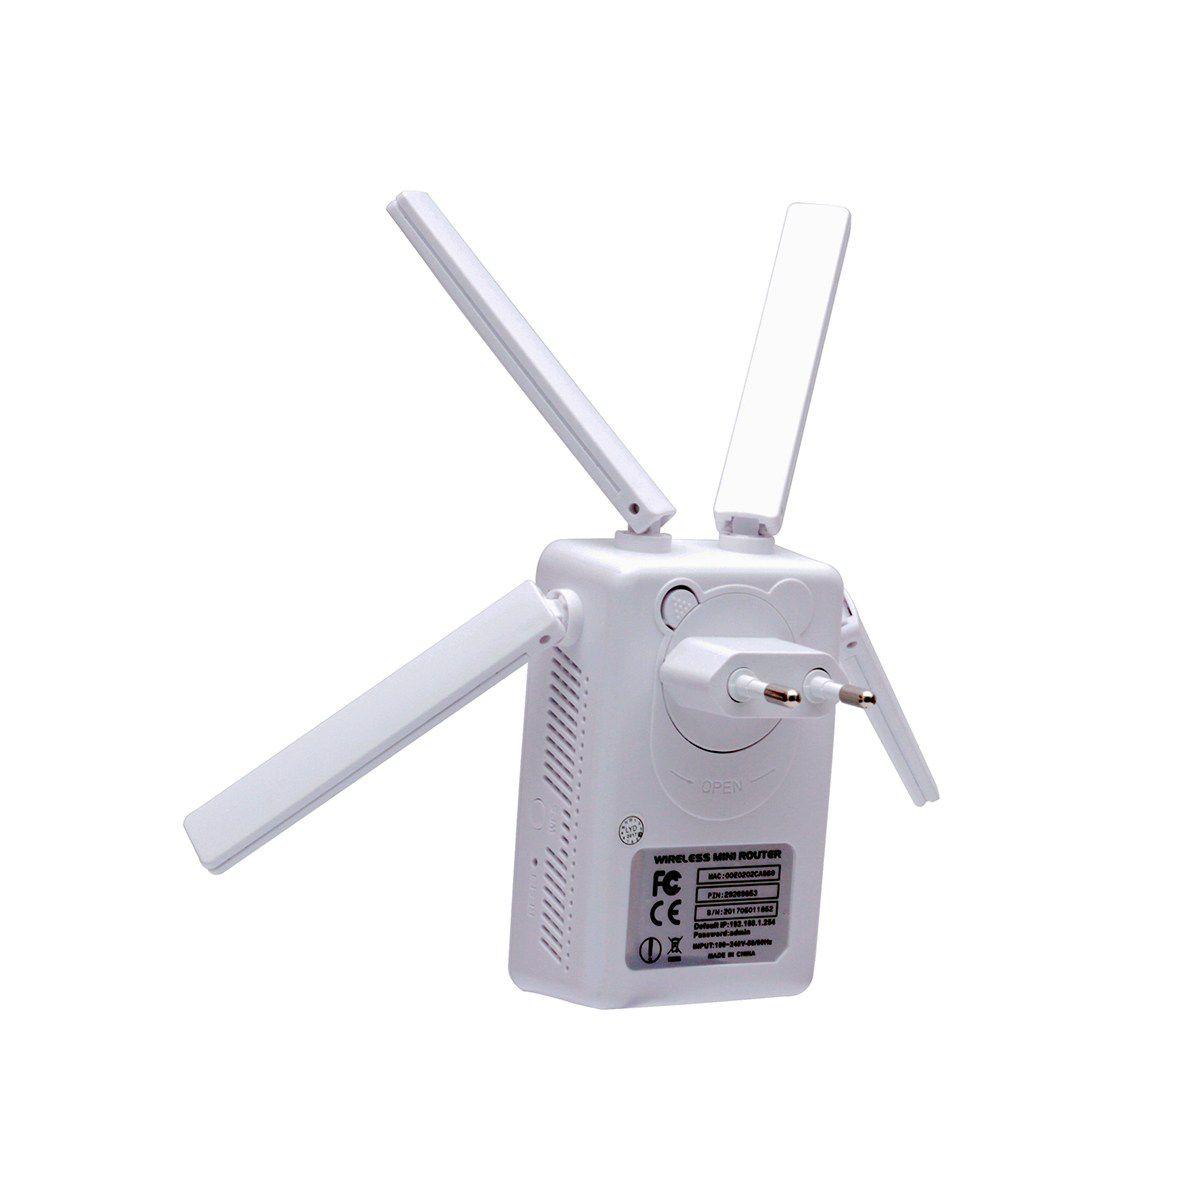 Repetidor Wifi Extensor 4 Antenas 300mbps Knup KP-3009